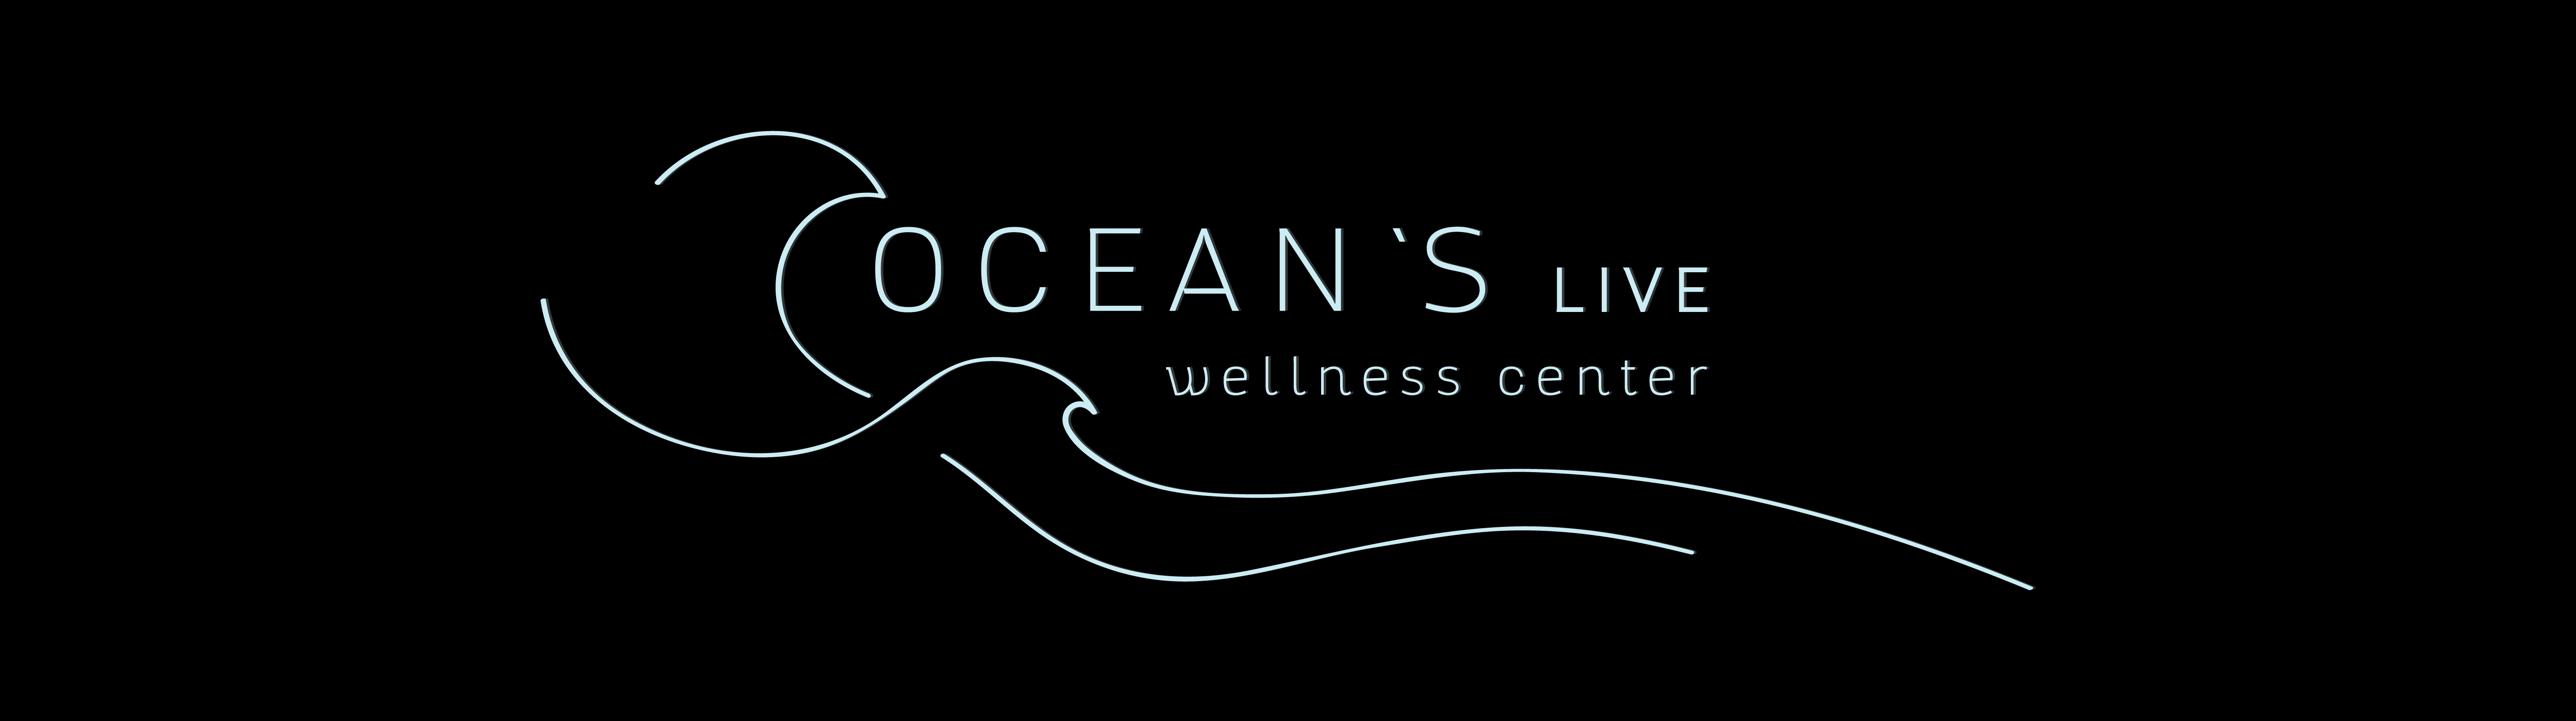 trilatera-diseño-grafico-web-bilbao-logotipo-oceans-live